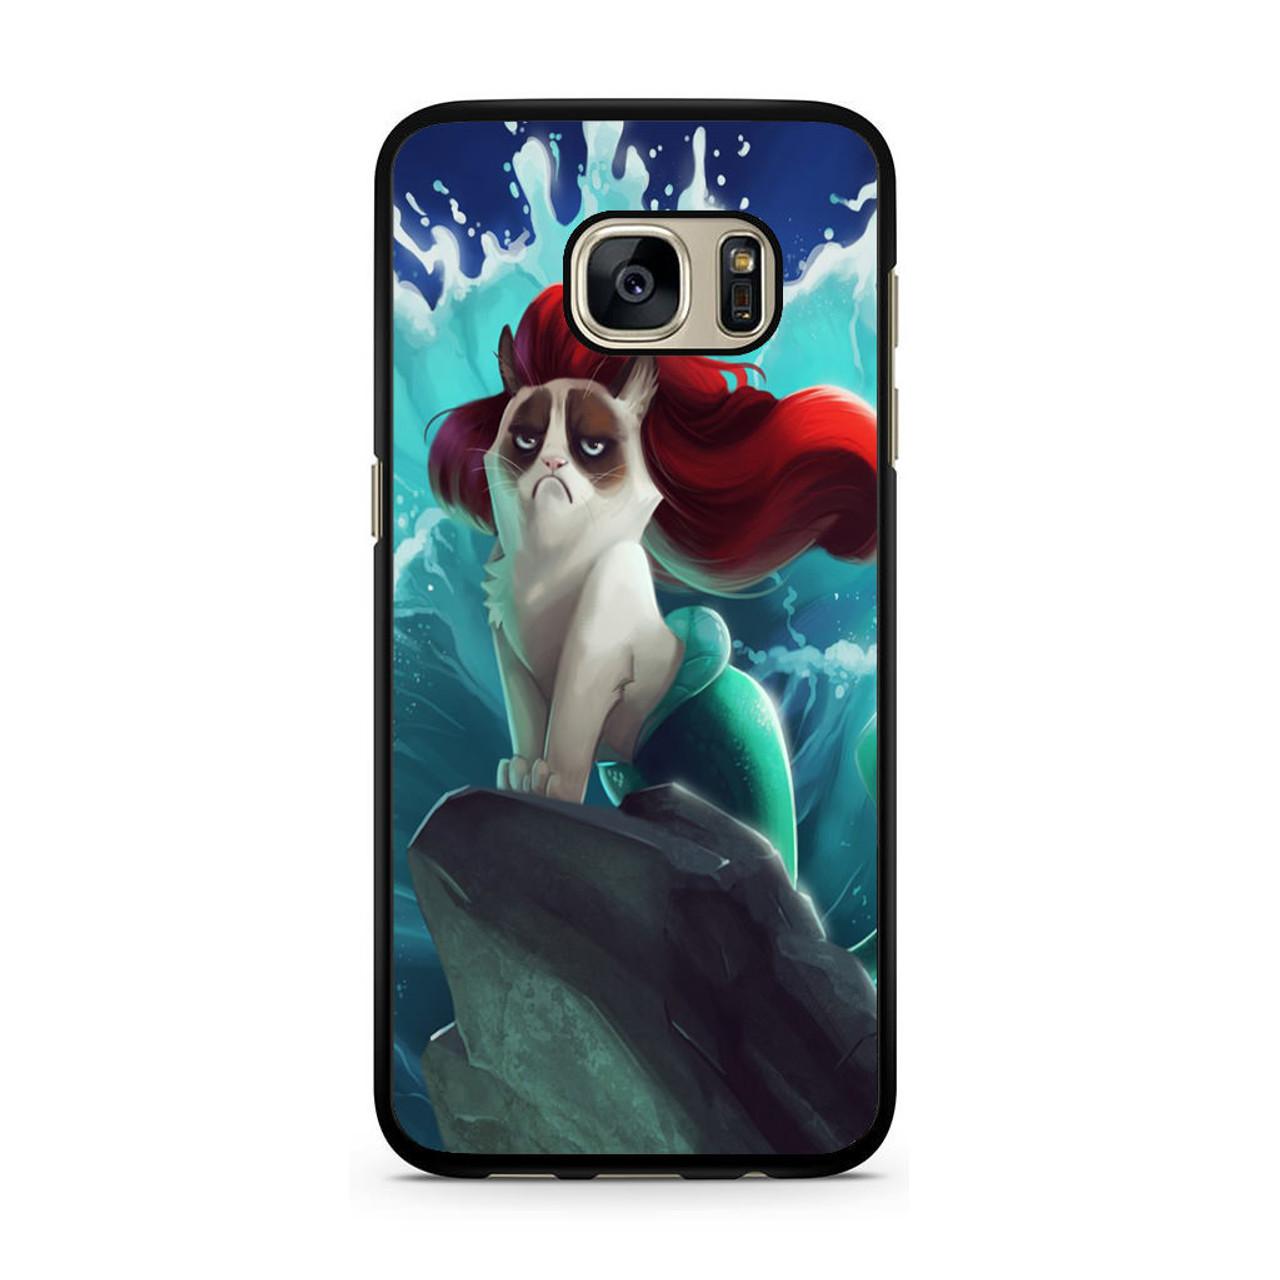 cheaper db172 476d5 Grumpy Cat and Disney Little Mermaid Samsung Galaxy S7 Case